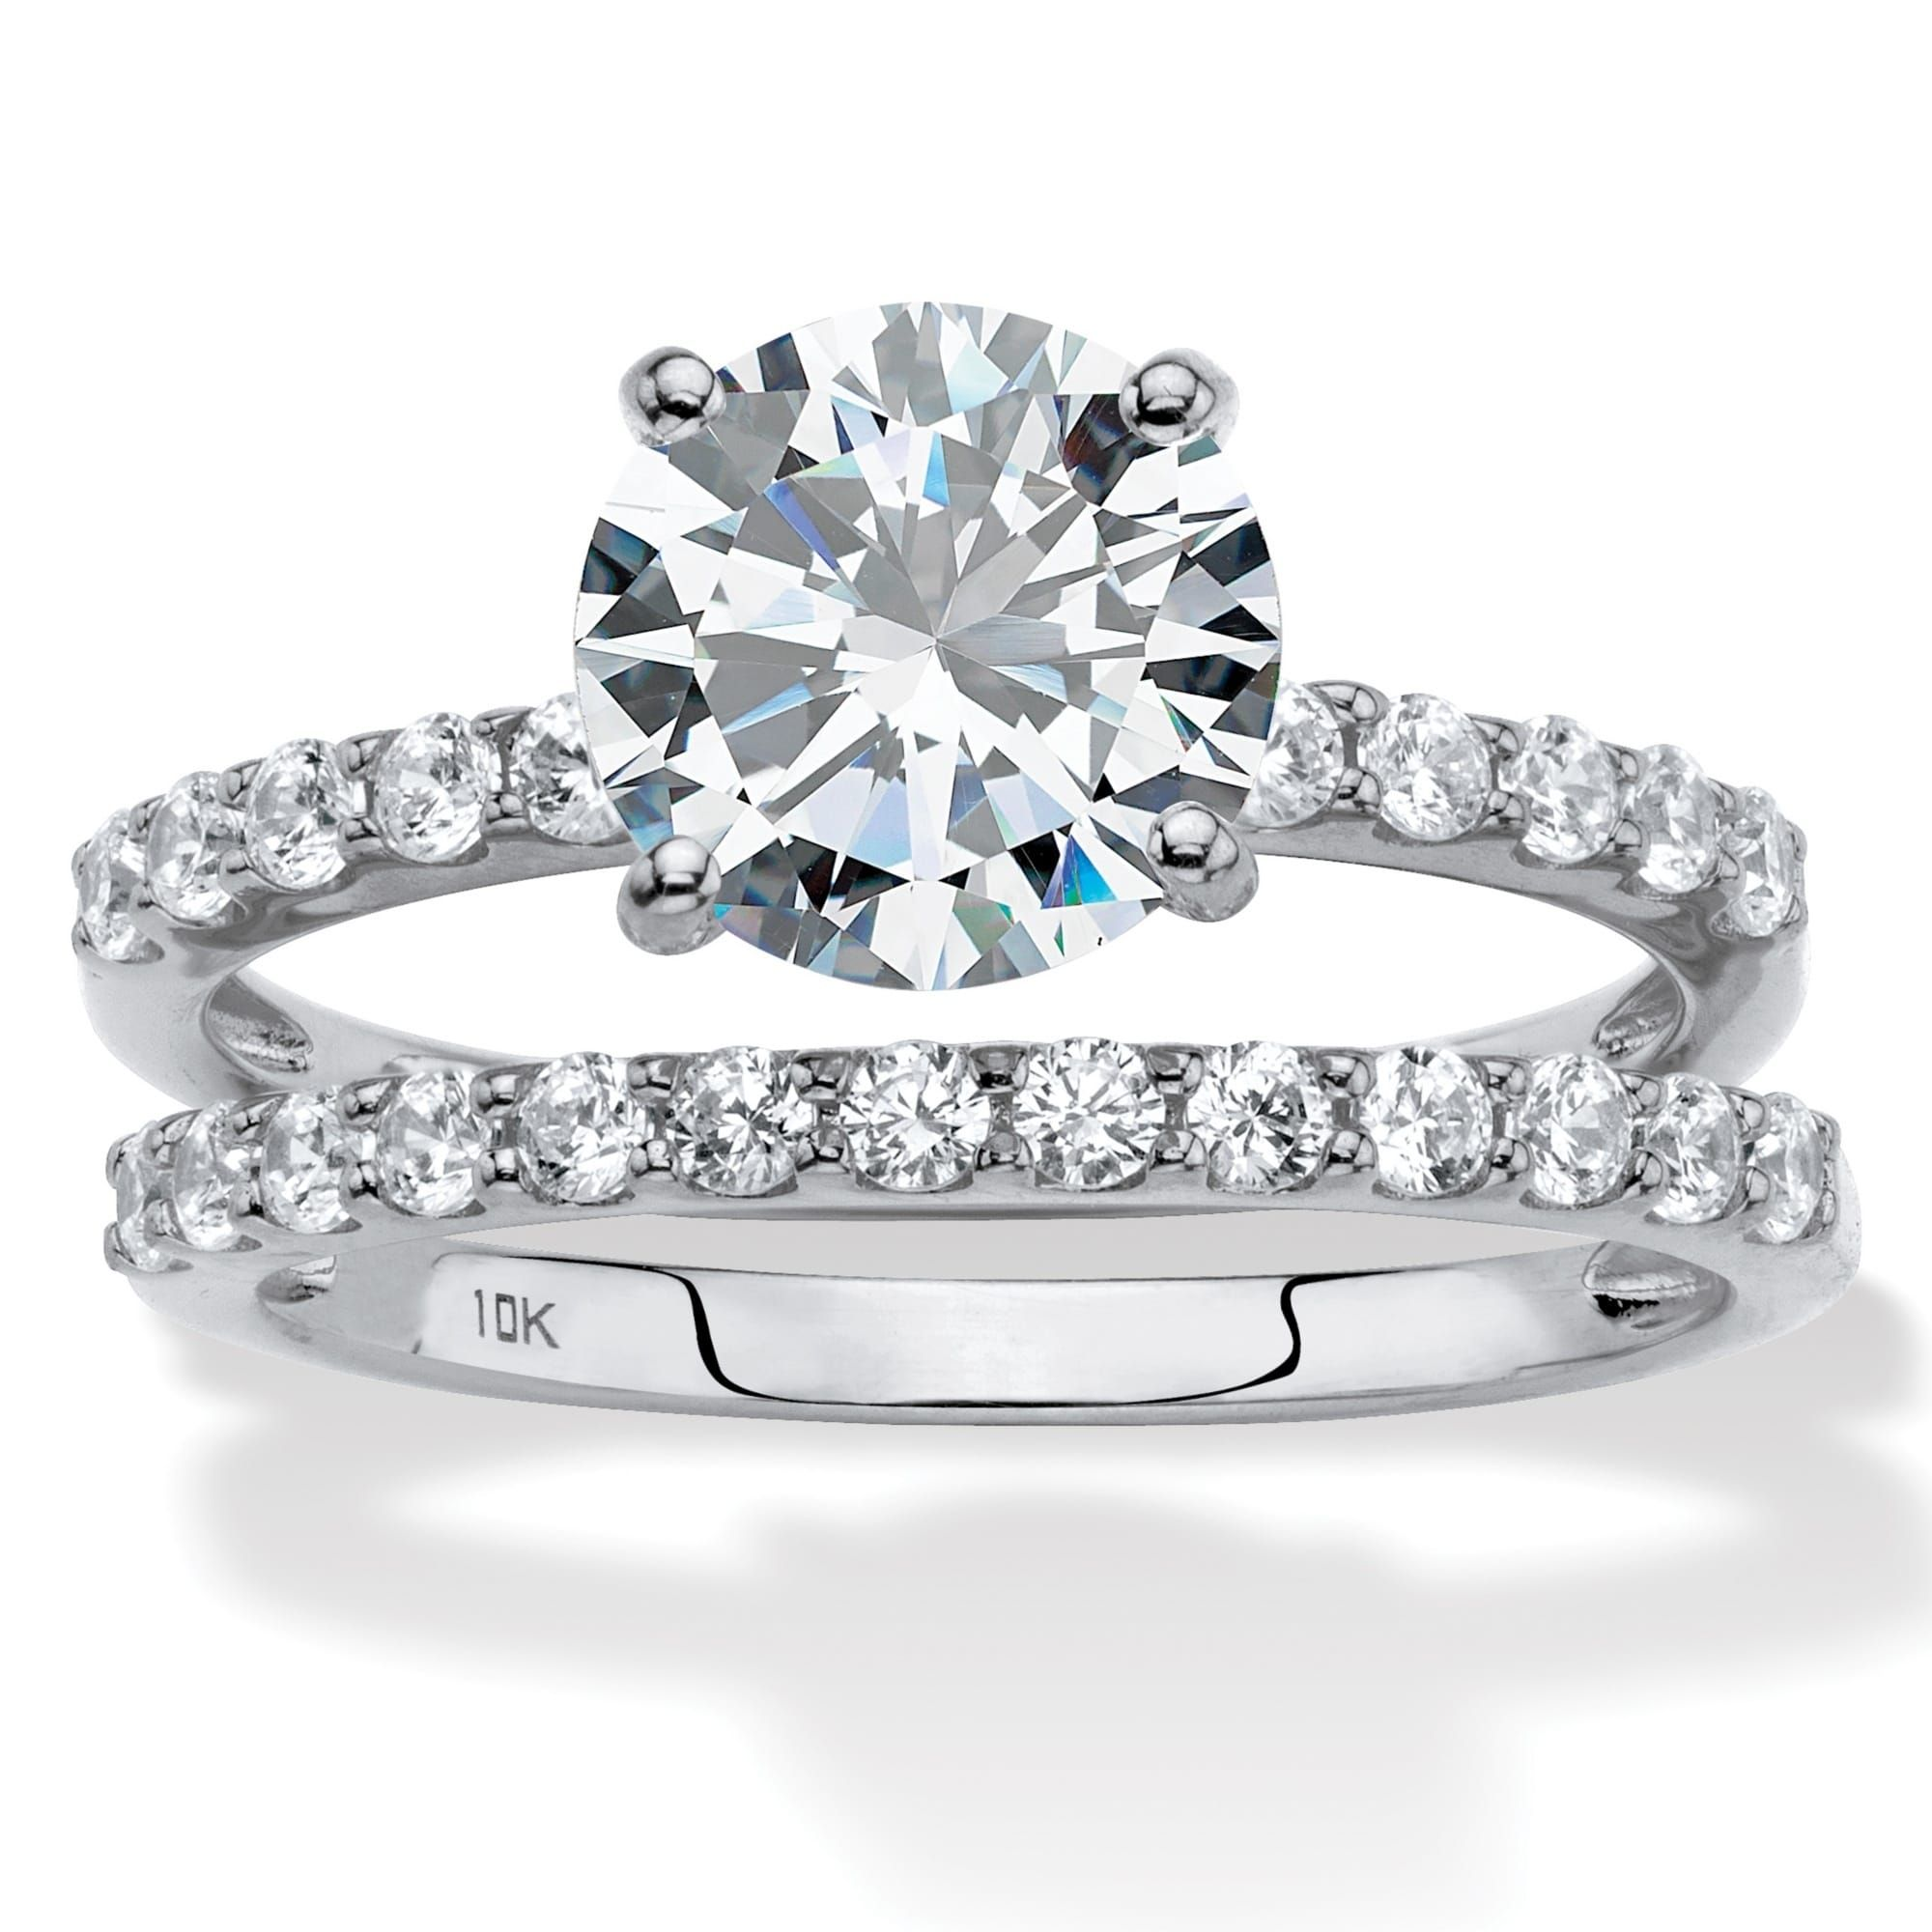 10K White Gold Cubic Zirconia Bridal Ring Set Bridal